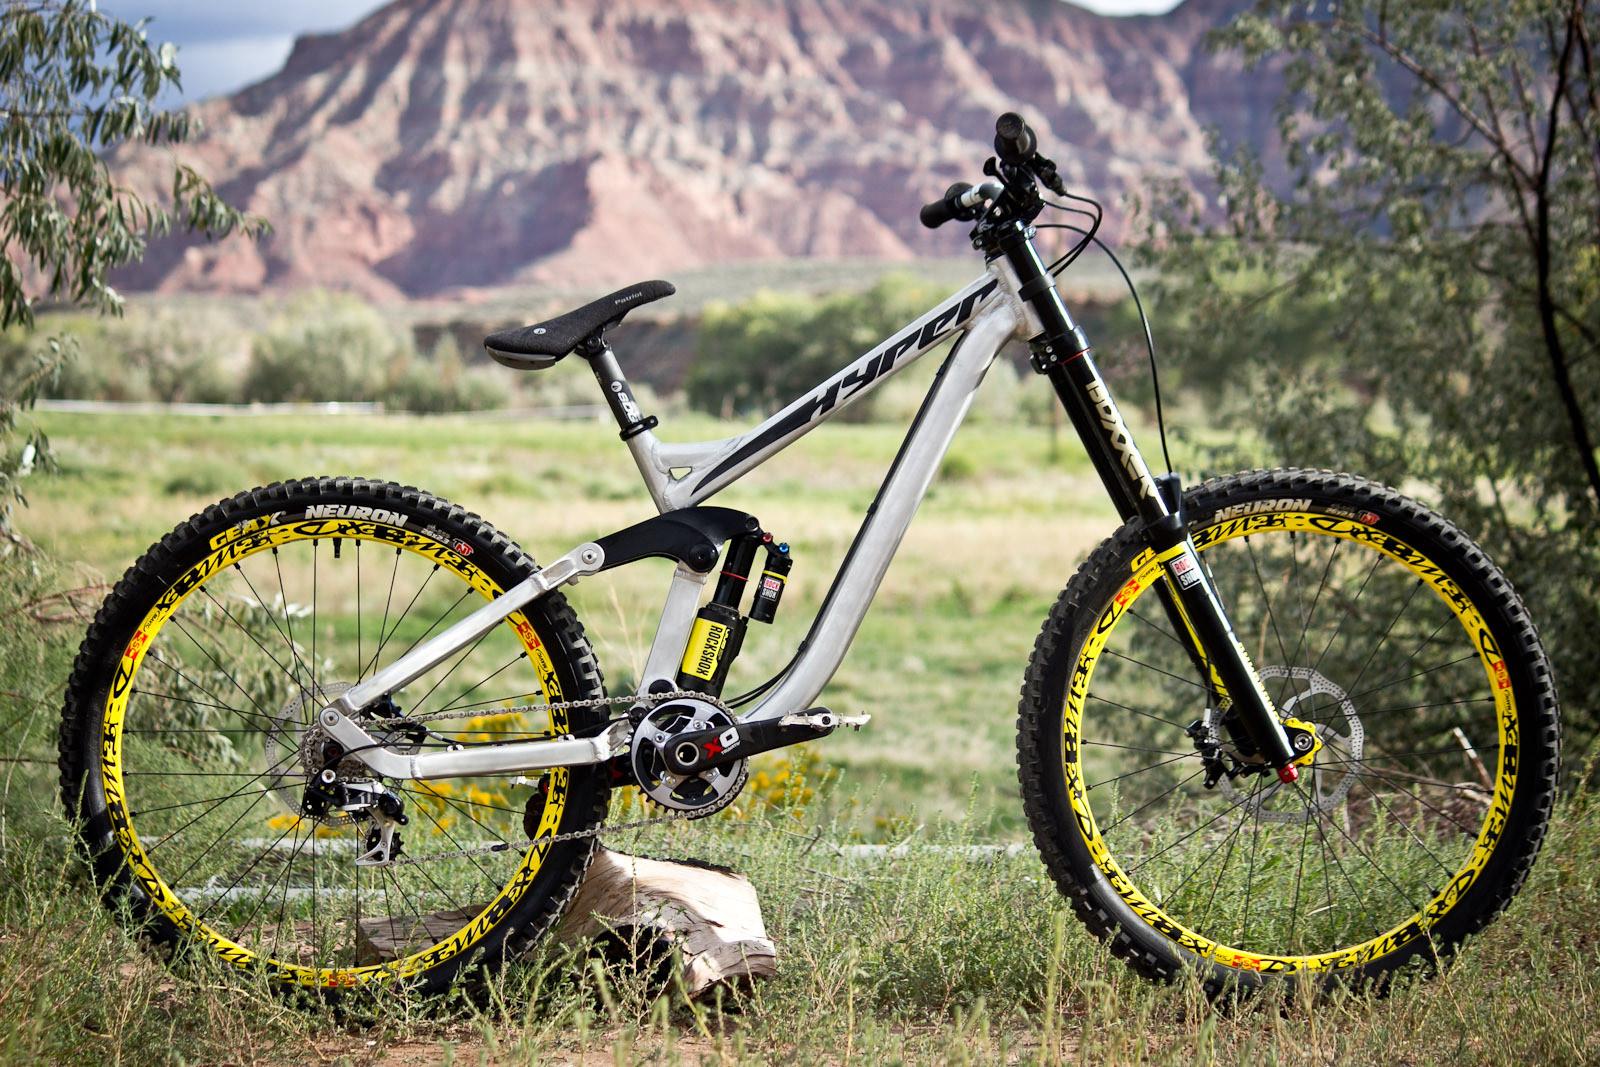 Rampage Pro Bike: Cam Zink's Prototype Hyper DH - Rampage Pro Bike: Cam Zink's Prototype Hyper DH - Mountain Biking Pictures - Vital MTB